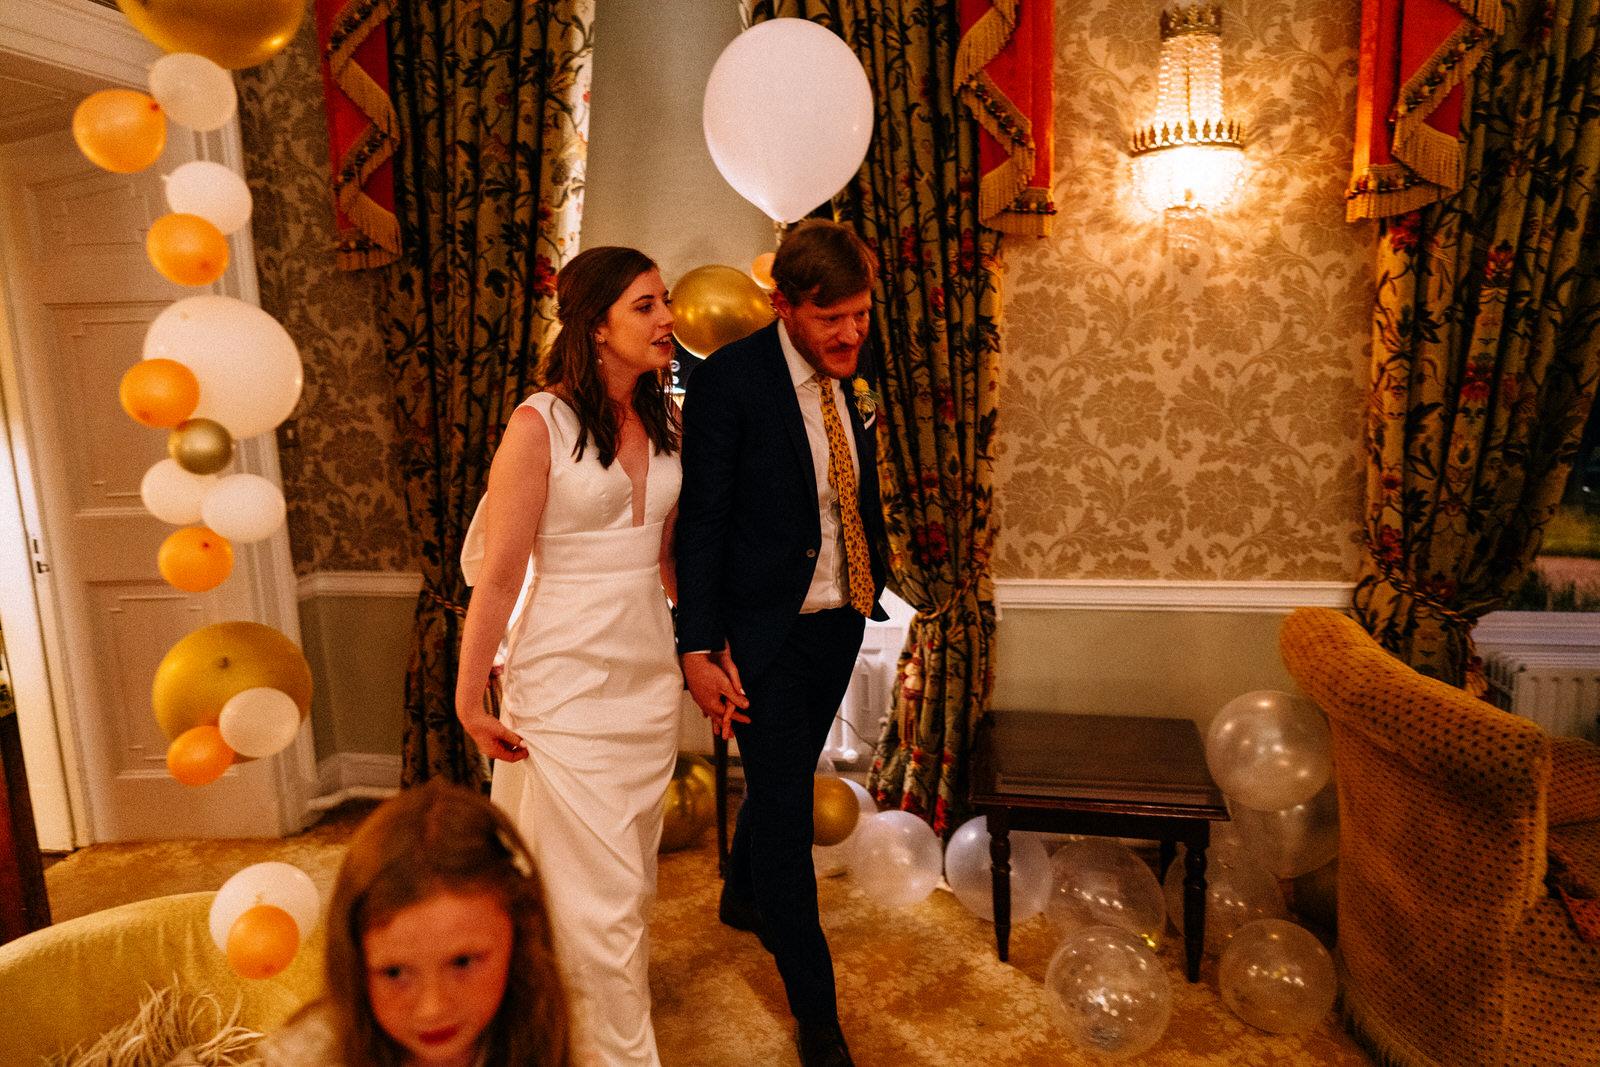 Cork documentary wedding photography 0188 187